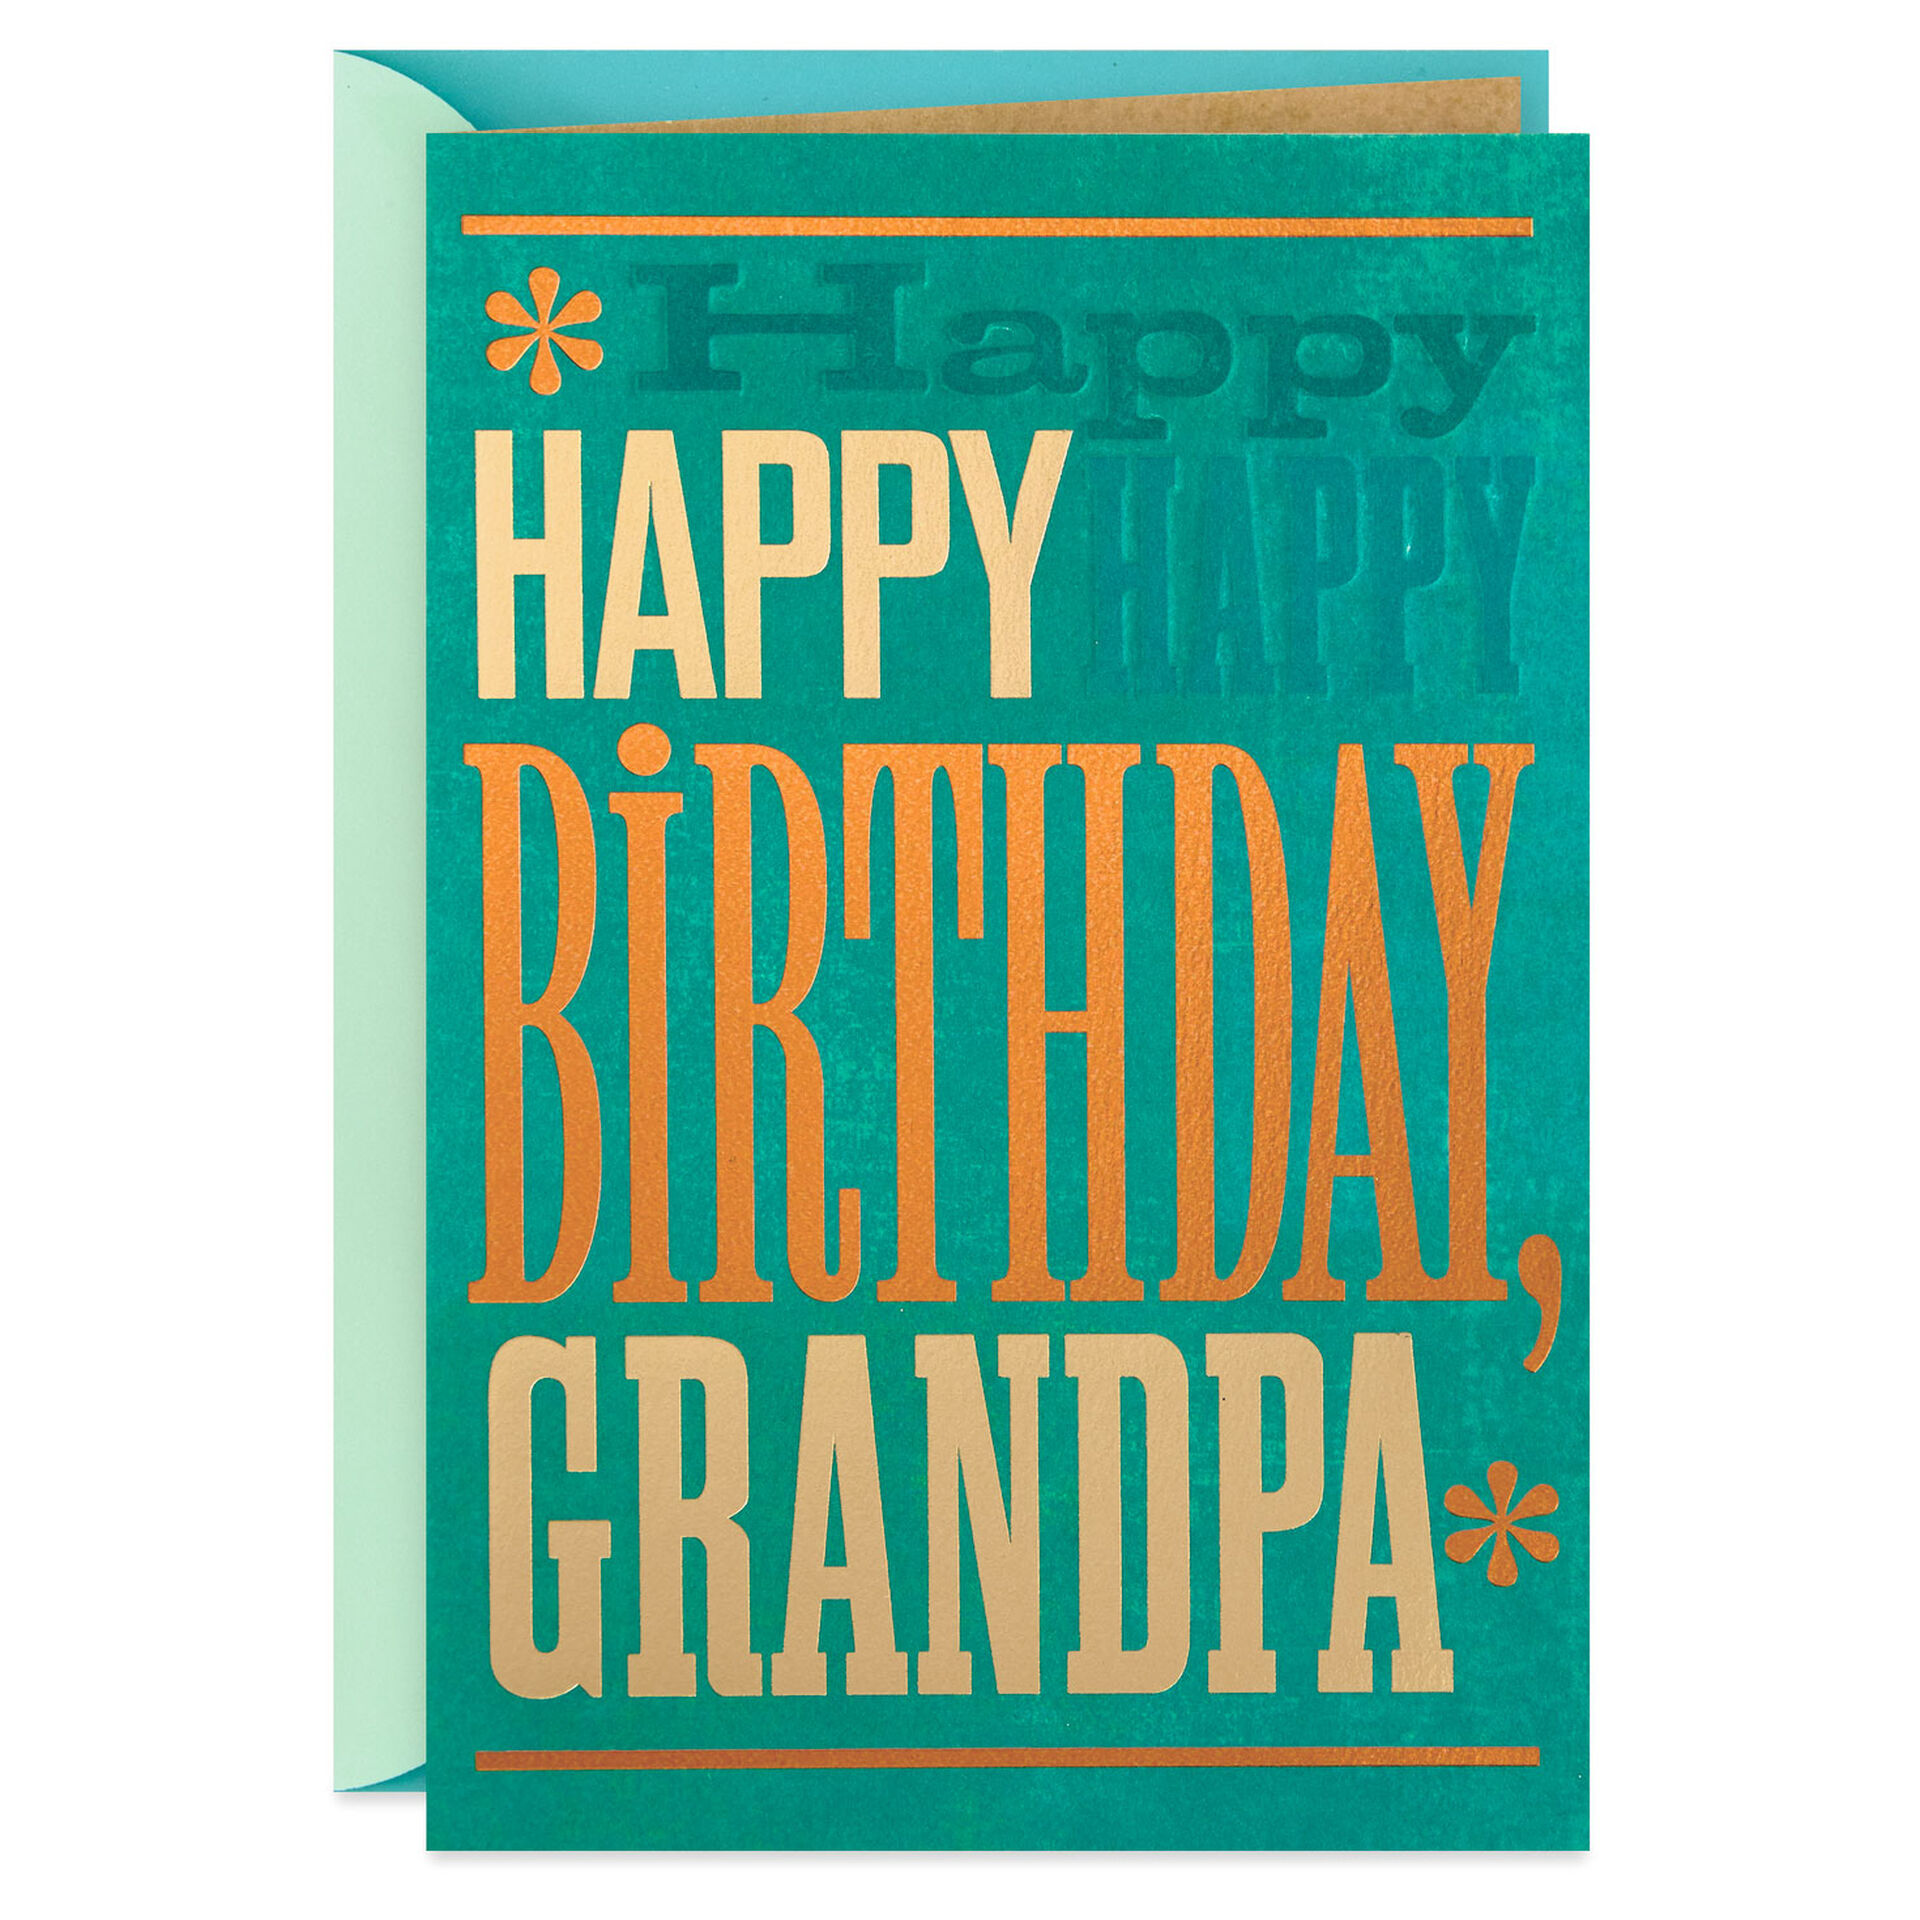 Happy Happy Happy Birthday Card For Grandpa Greeting Cards Hallmark